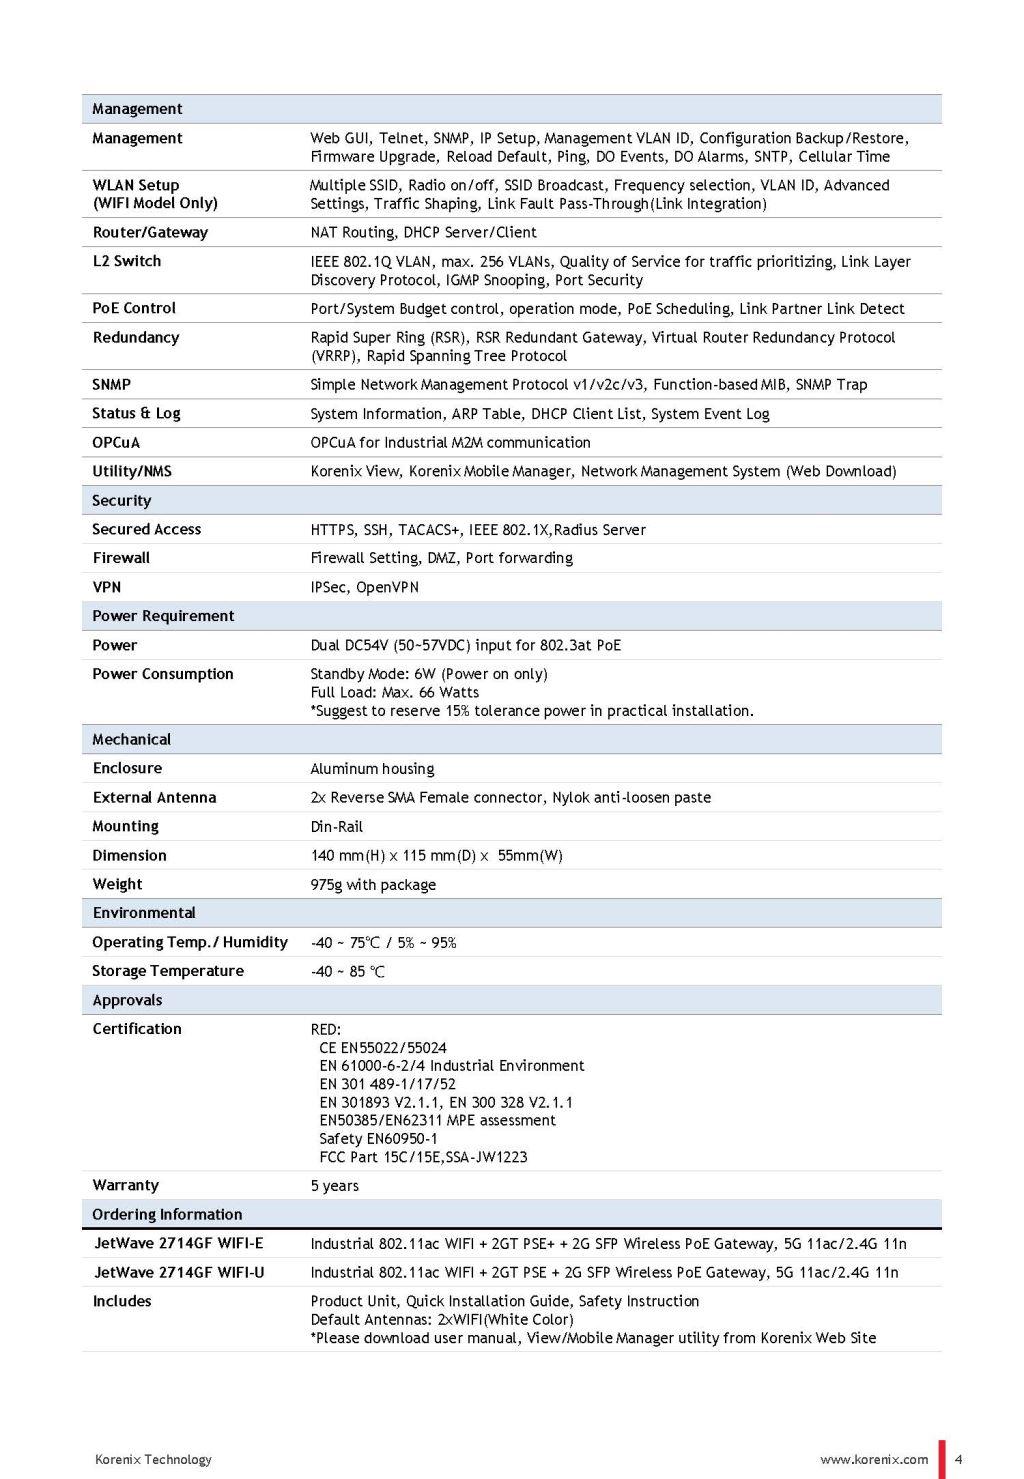 Korenix JetWave 2714GF LTE/WIFI Series Industrial Cellular PoE Gateway